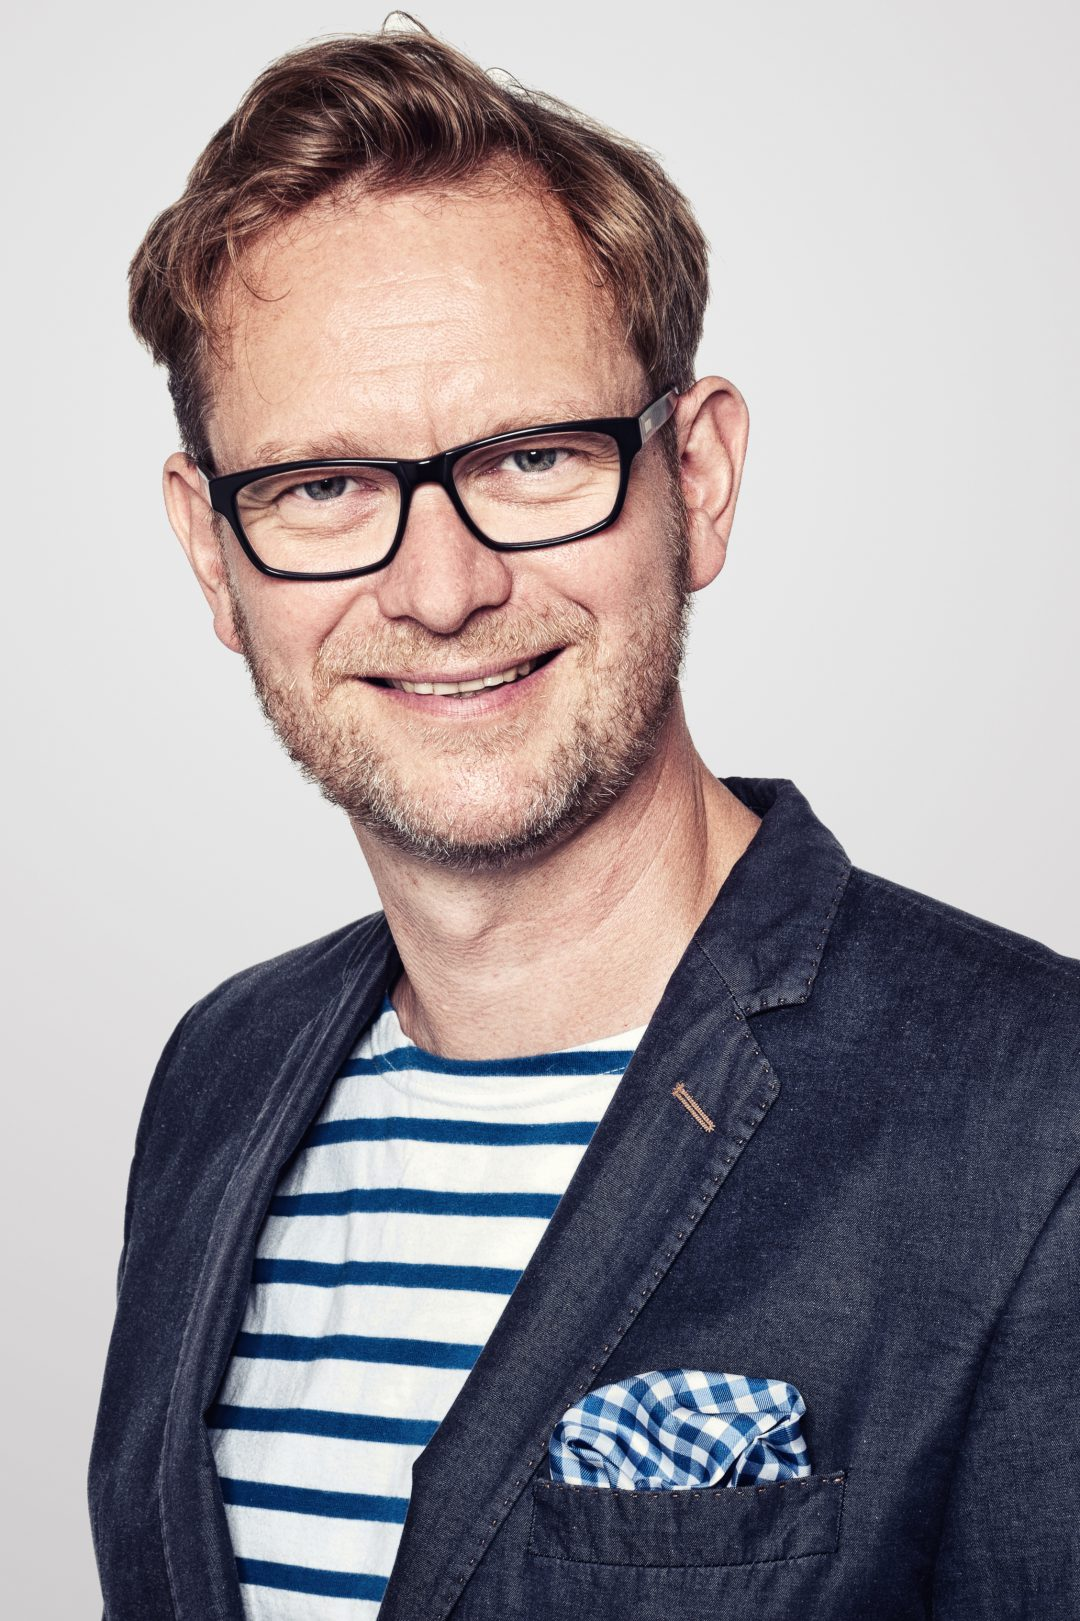 Martin Sierp